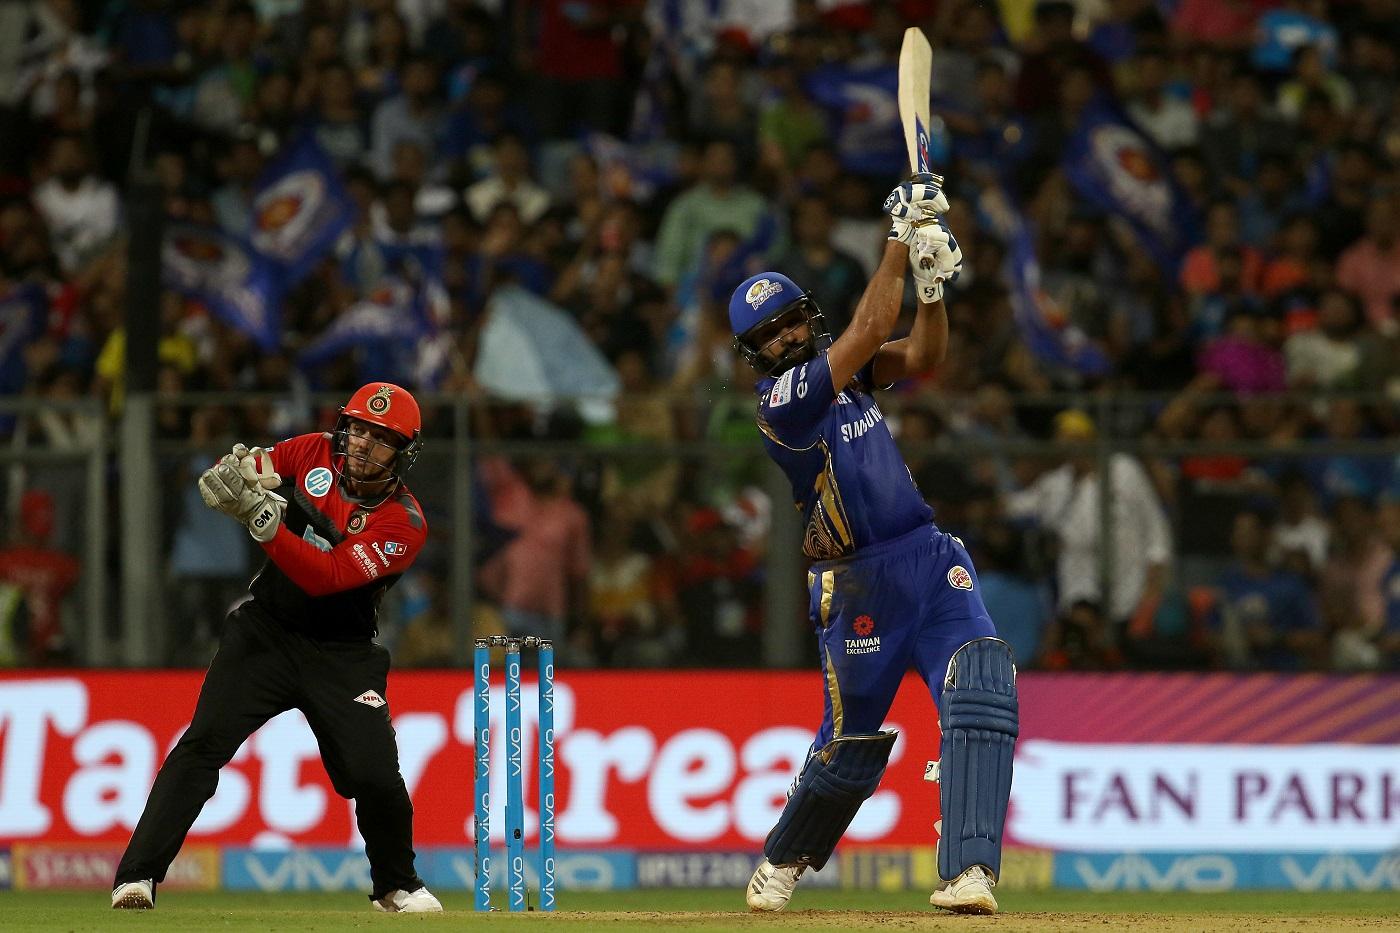 MI vs RCB   IPL 2018 MATCH No 14